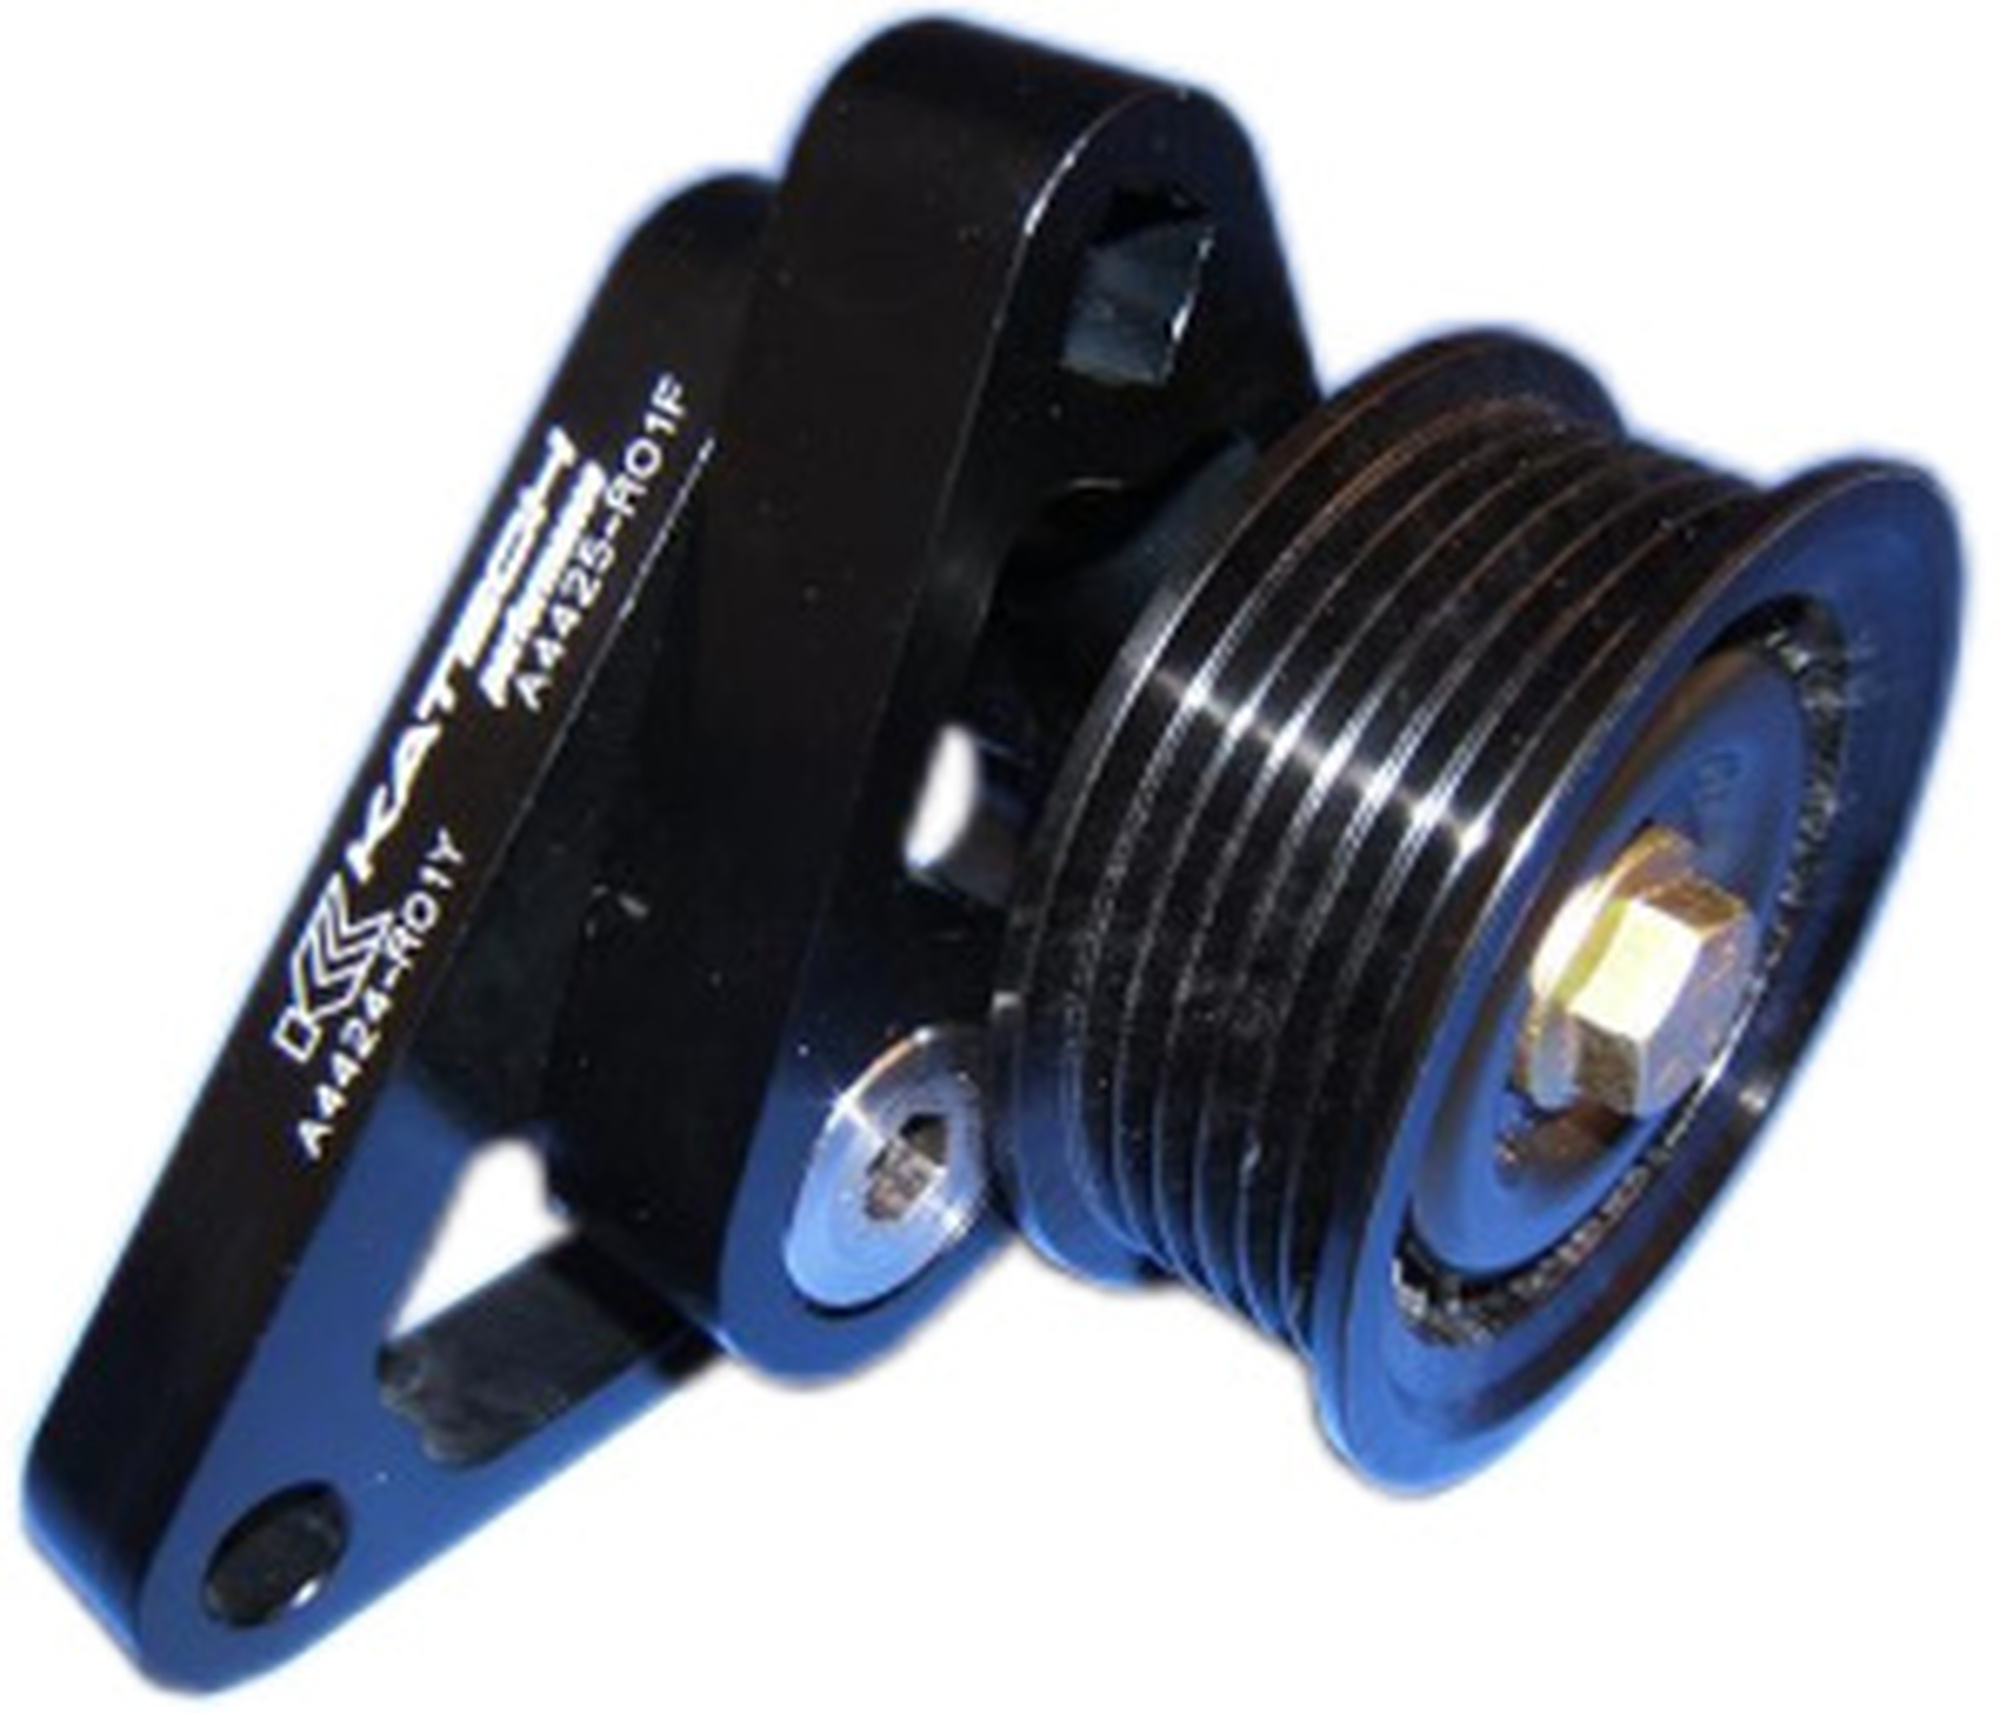 ls1 gto belt diagram katech billet belt tensioner for corvette  cts v  camaro  firebird  katech billet belt tensioner for